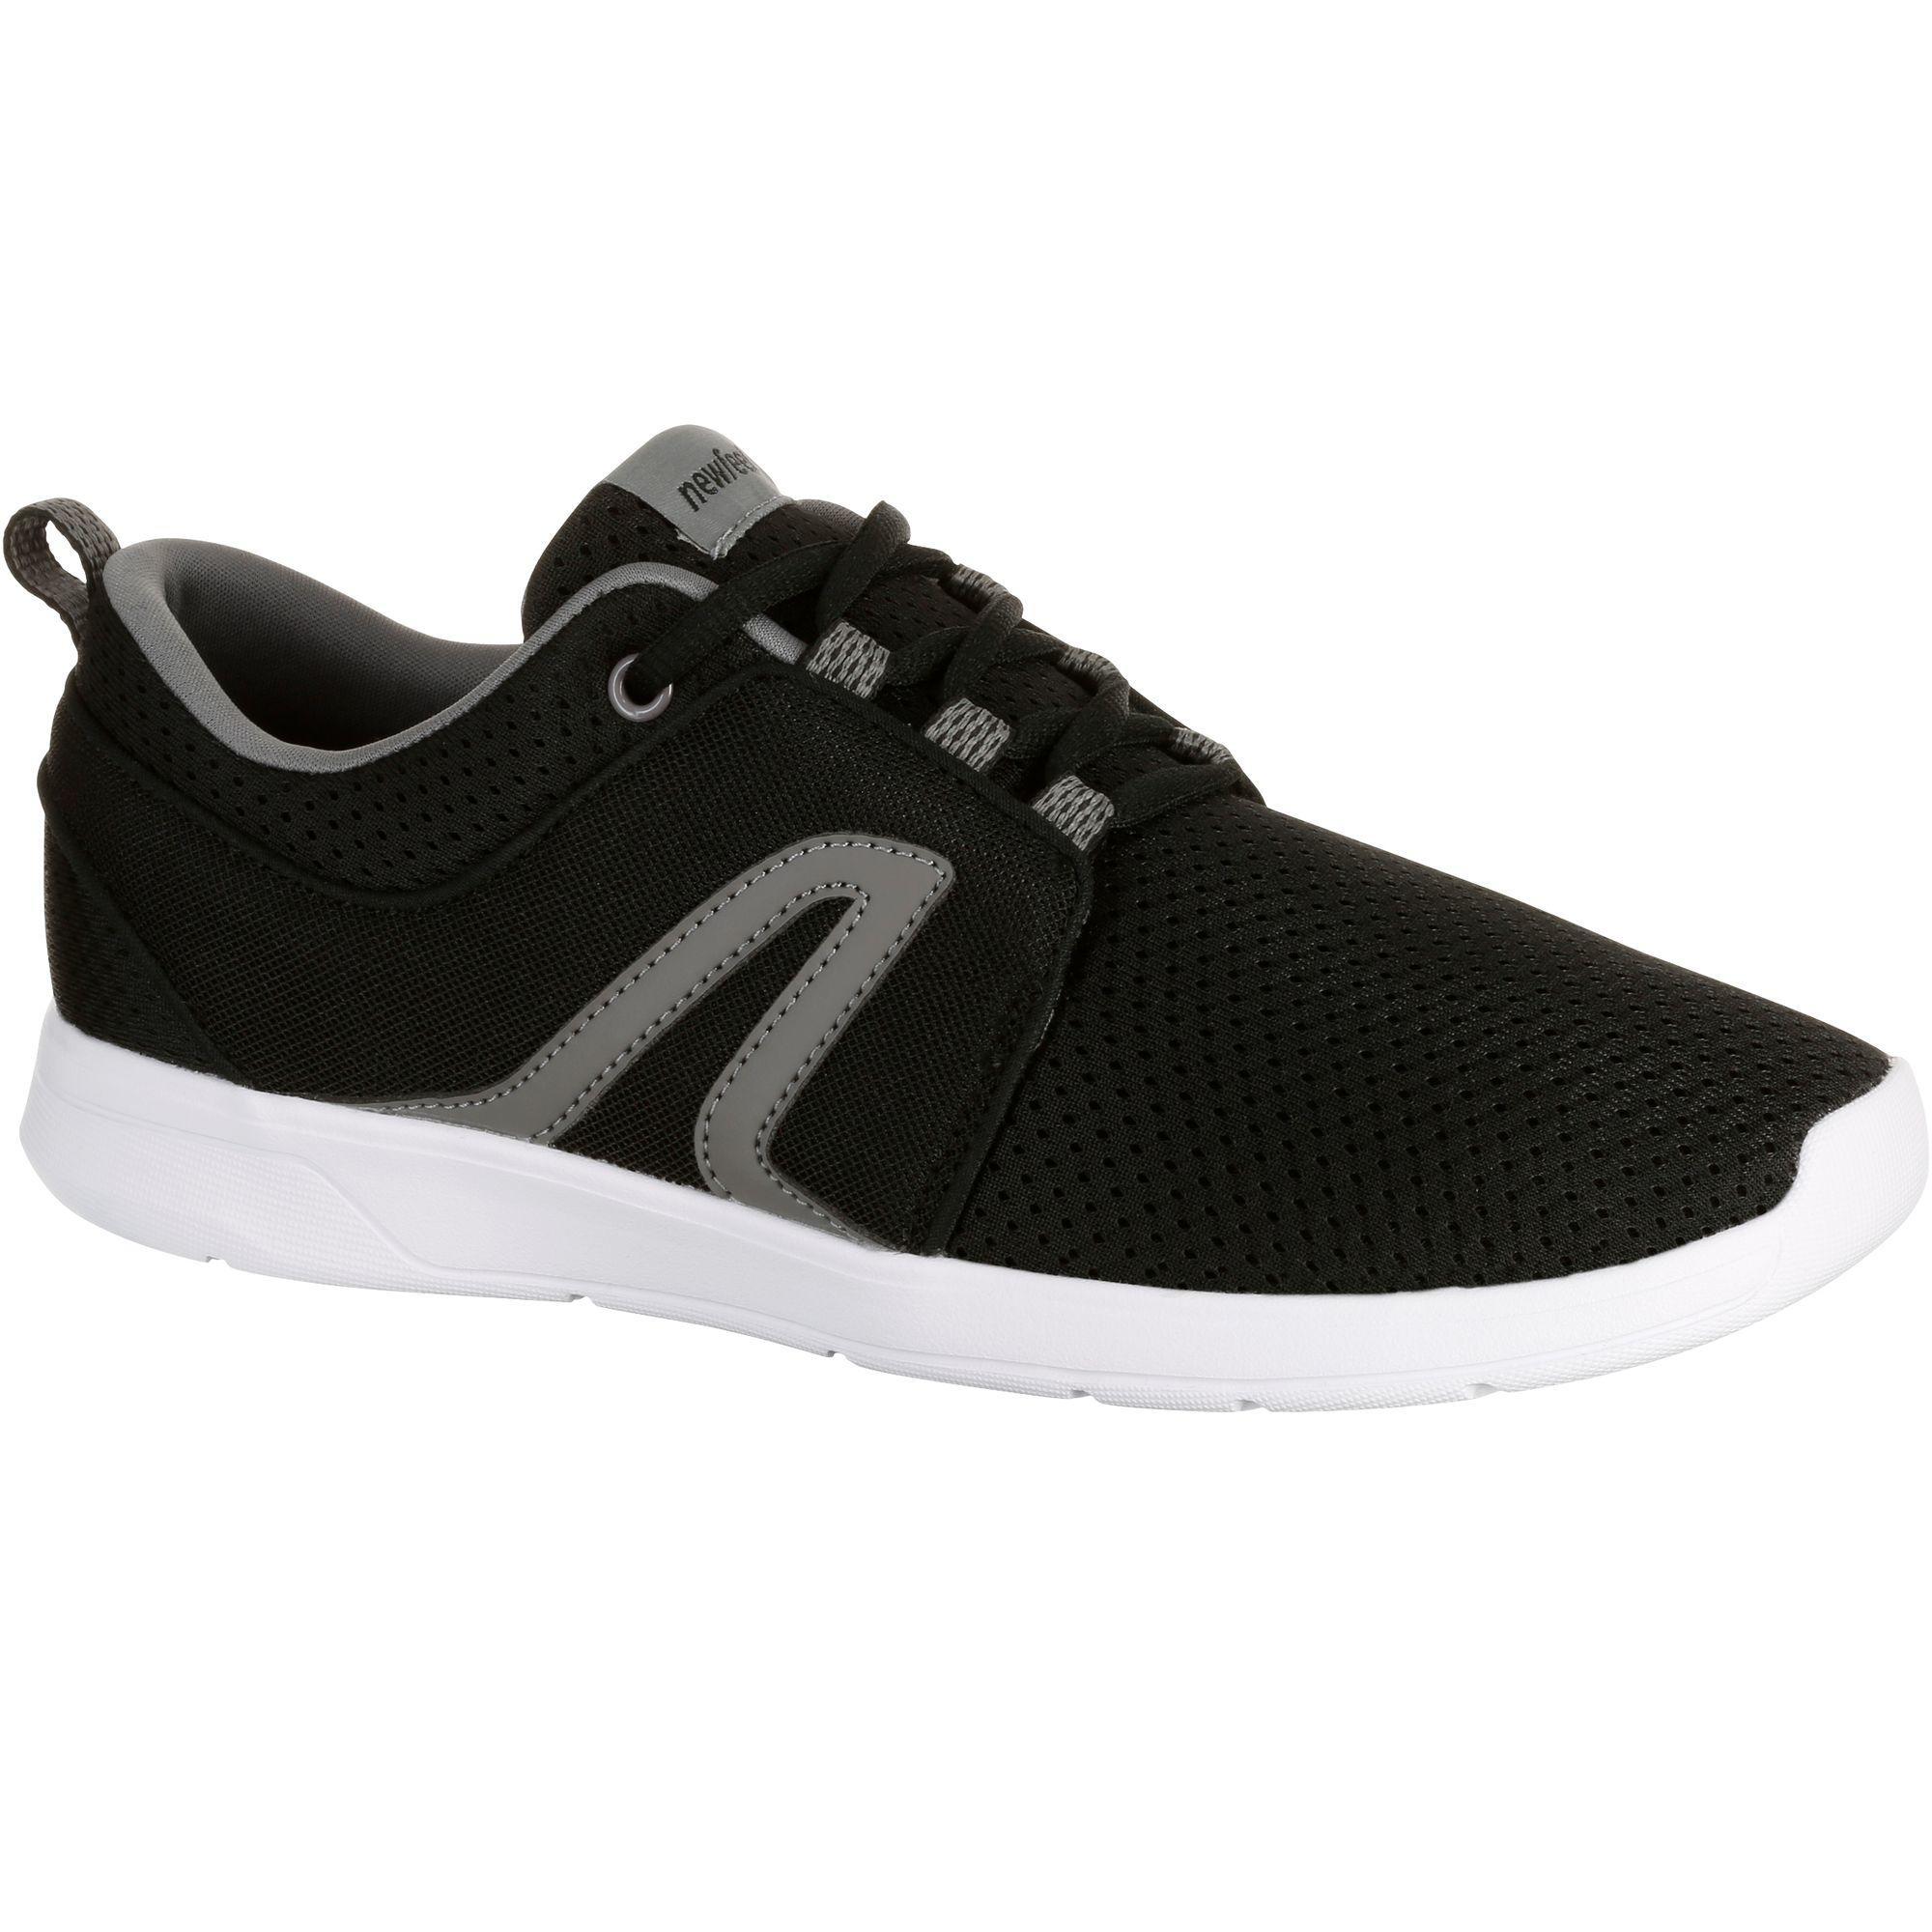 Chaussures marche sportive femme Soft 140 noir